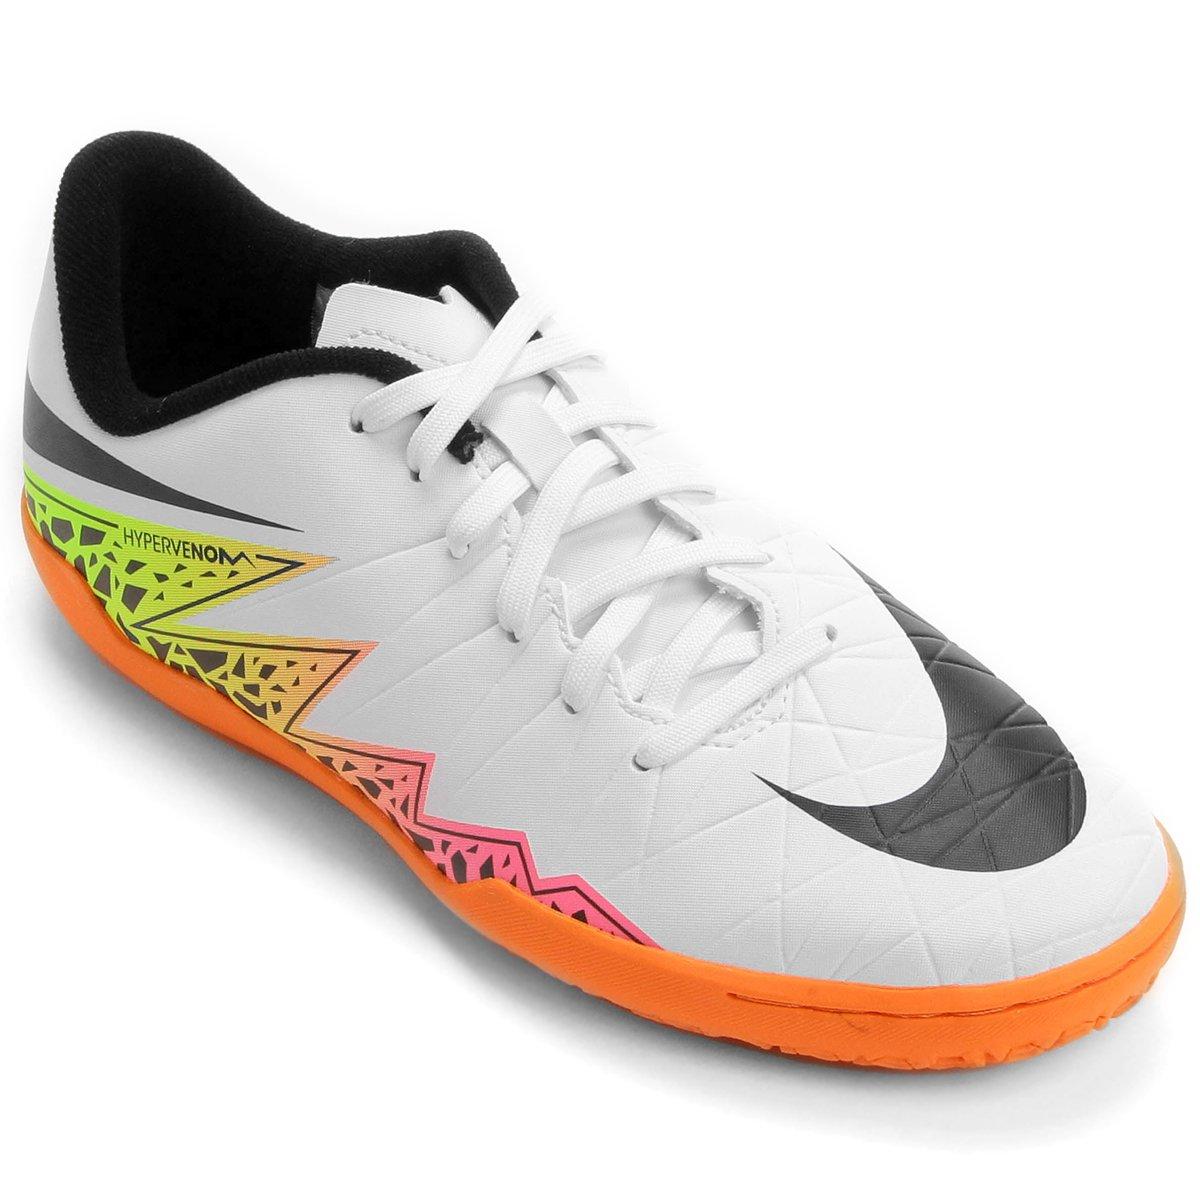 sale retailer 76535 01b11 ... sweden chuteira futsal infantil nike hypervenom phelon 2 ic compre agora  netshoes c08a9 6f657